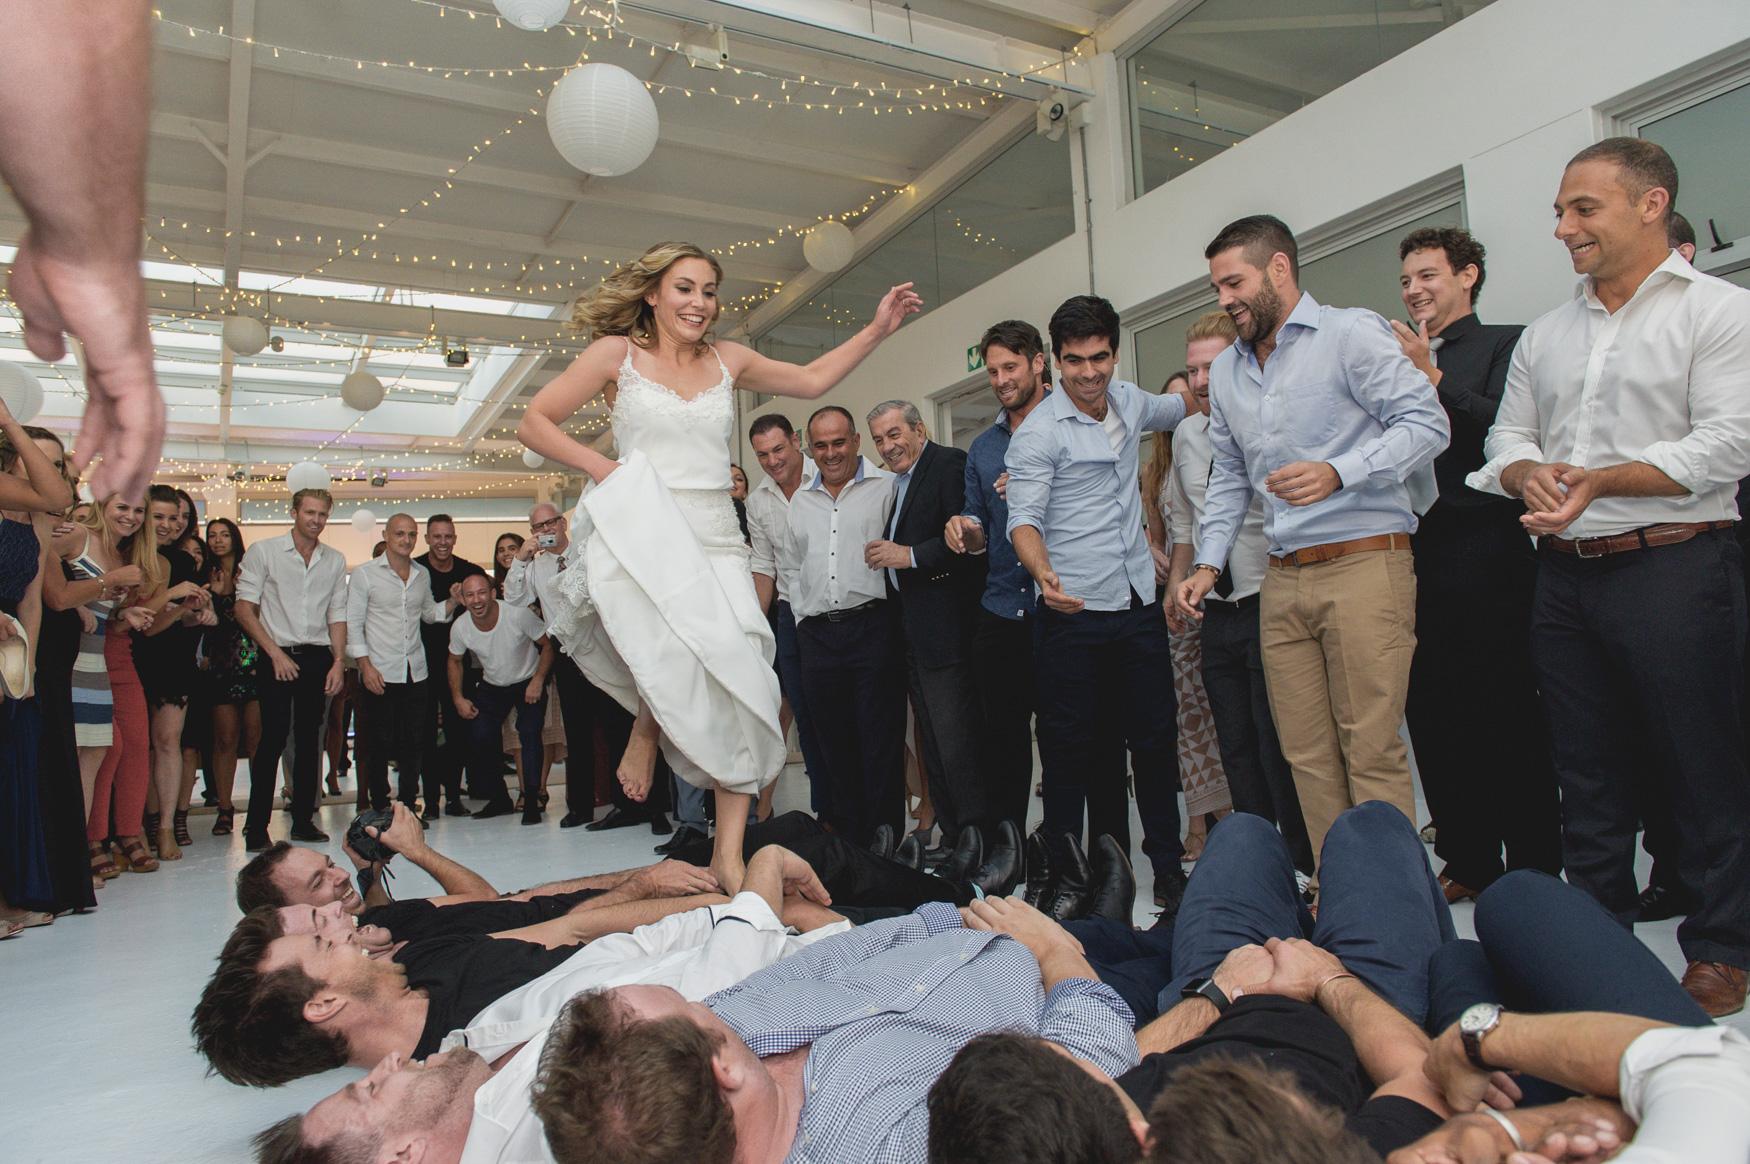 john-henry-wedding-photographer-mike-louise-001-21.jpg